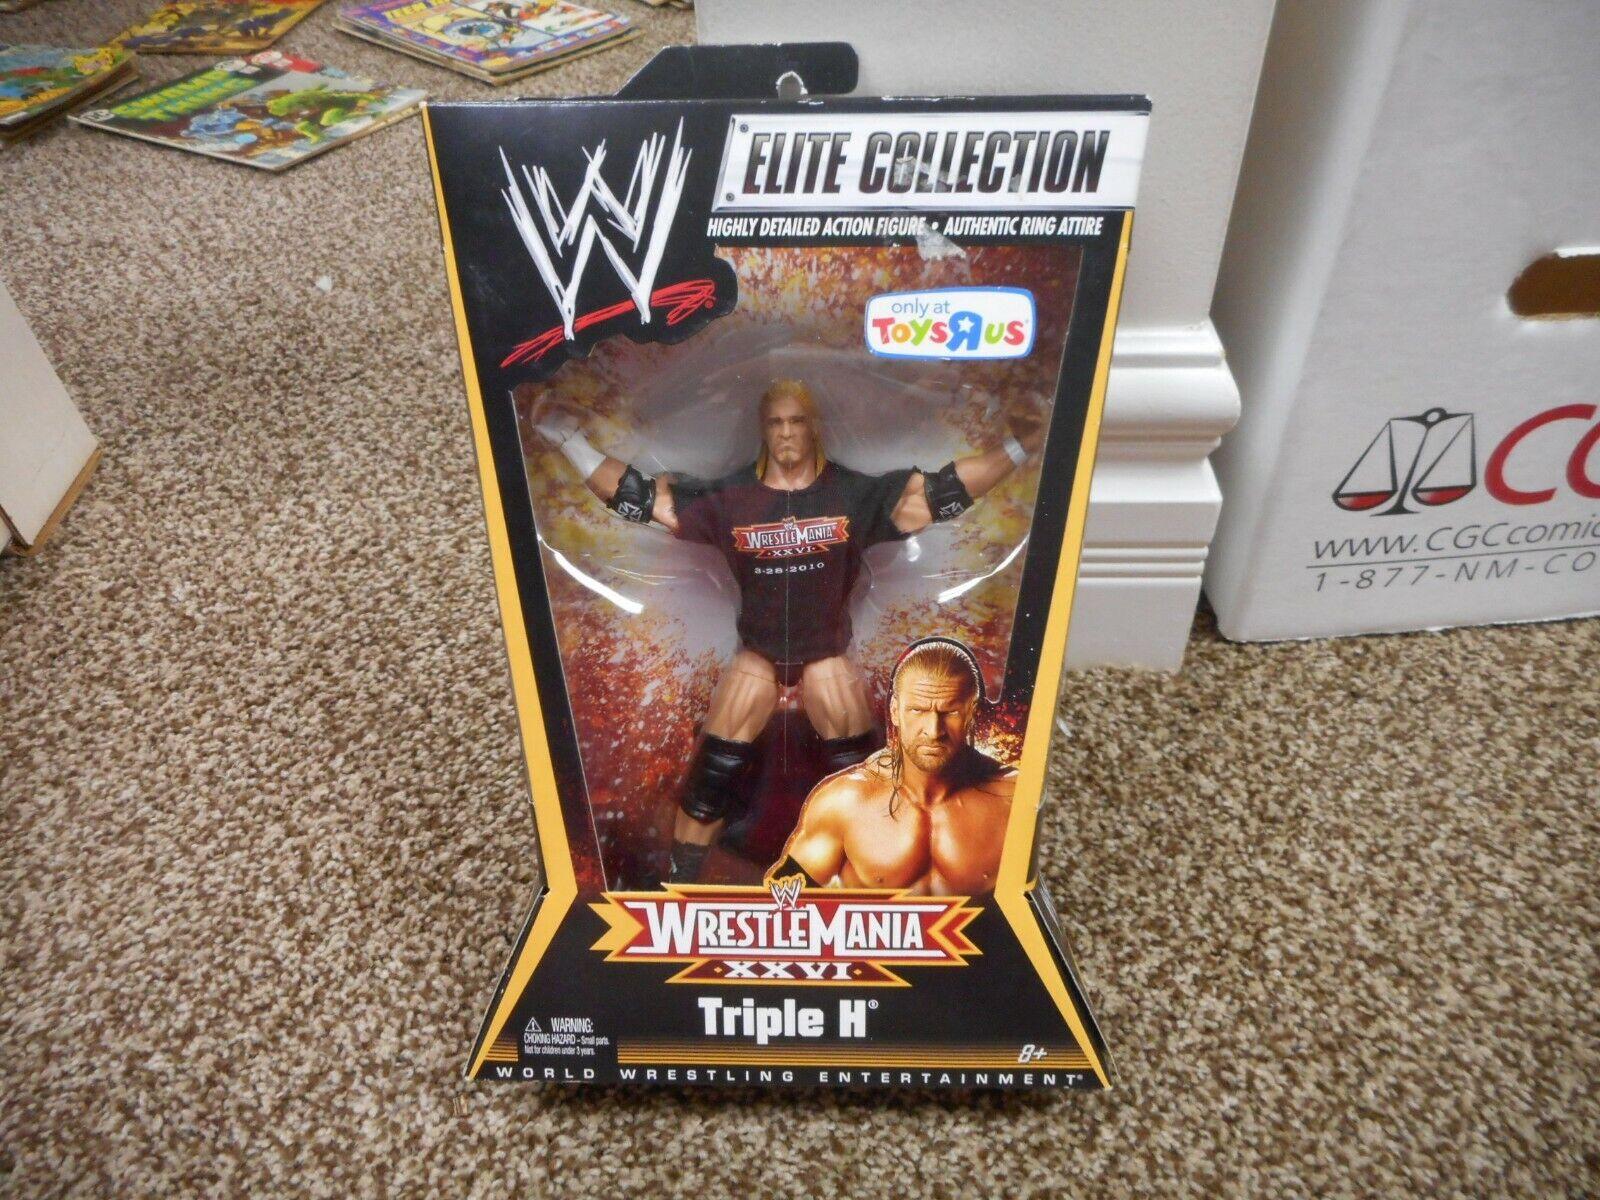 Triple H Wwe Elite MIB Sigillato Scatola Moc Wrestlemania Xxvi Set 26 Juguetes R US